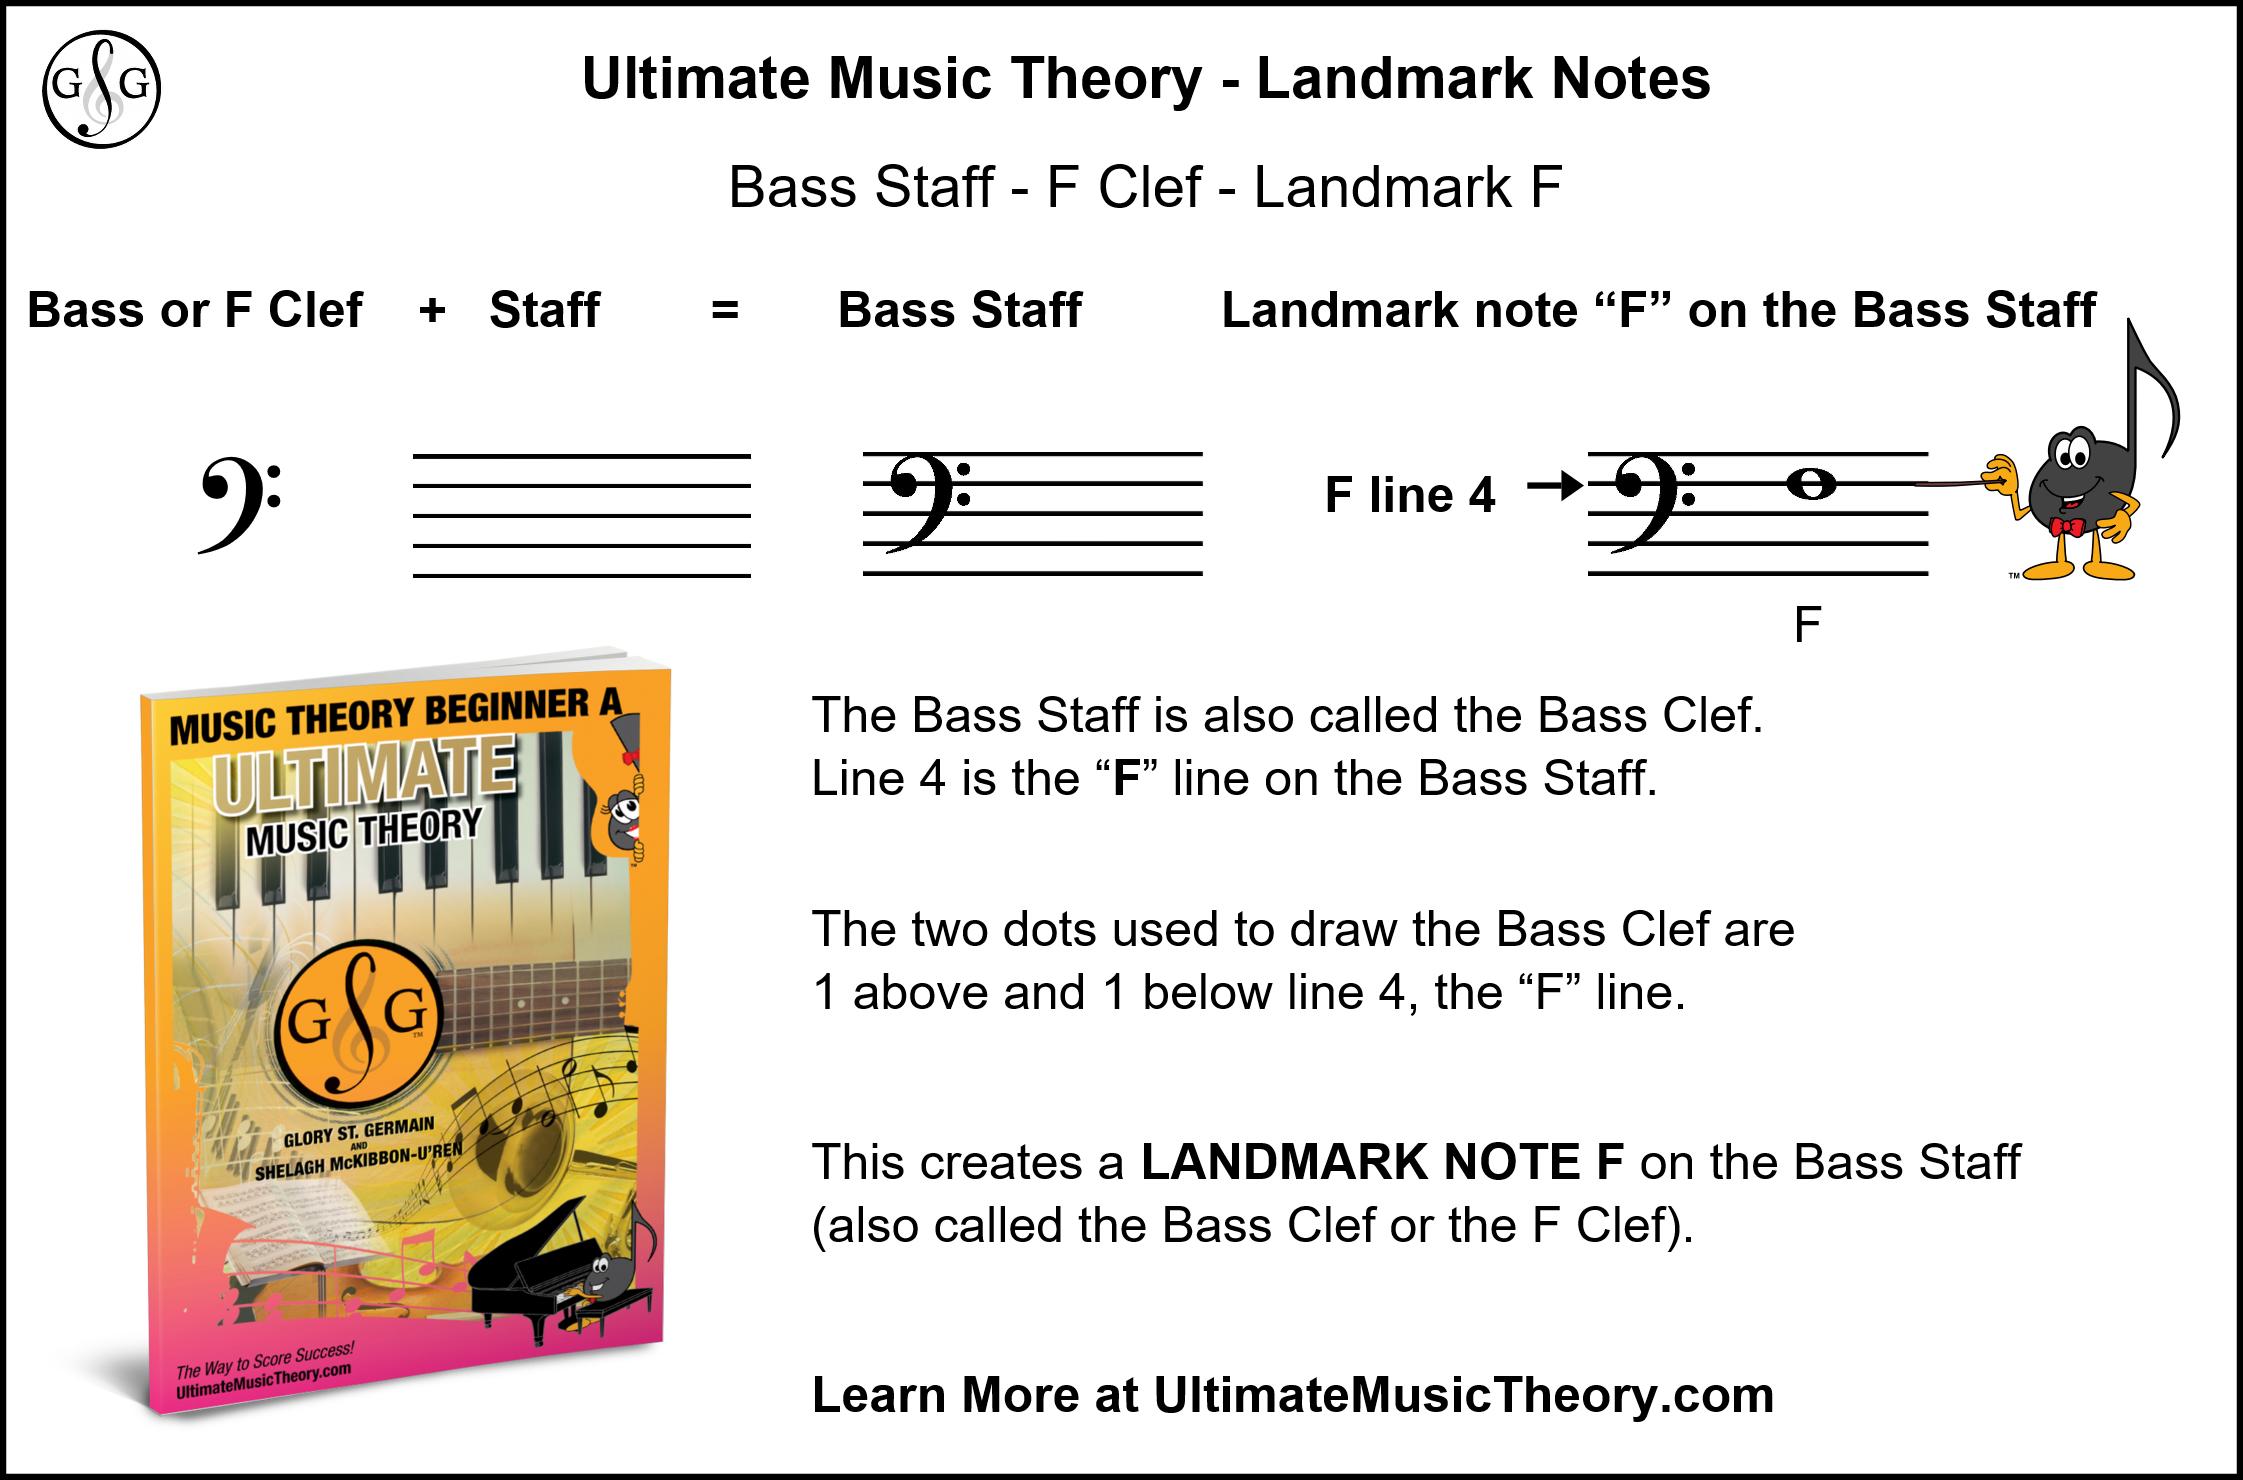 UMT Landmark Bass Staff